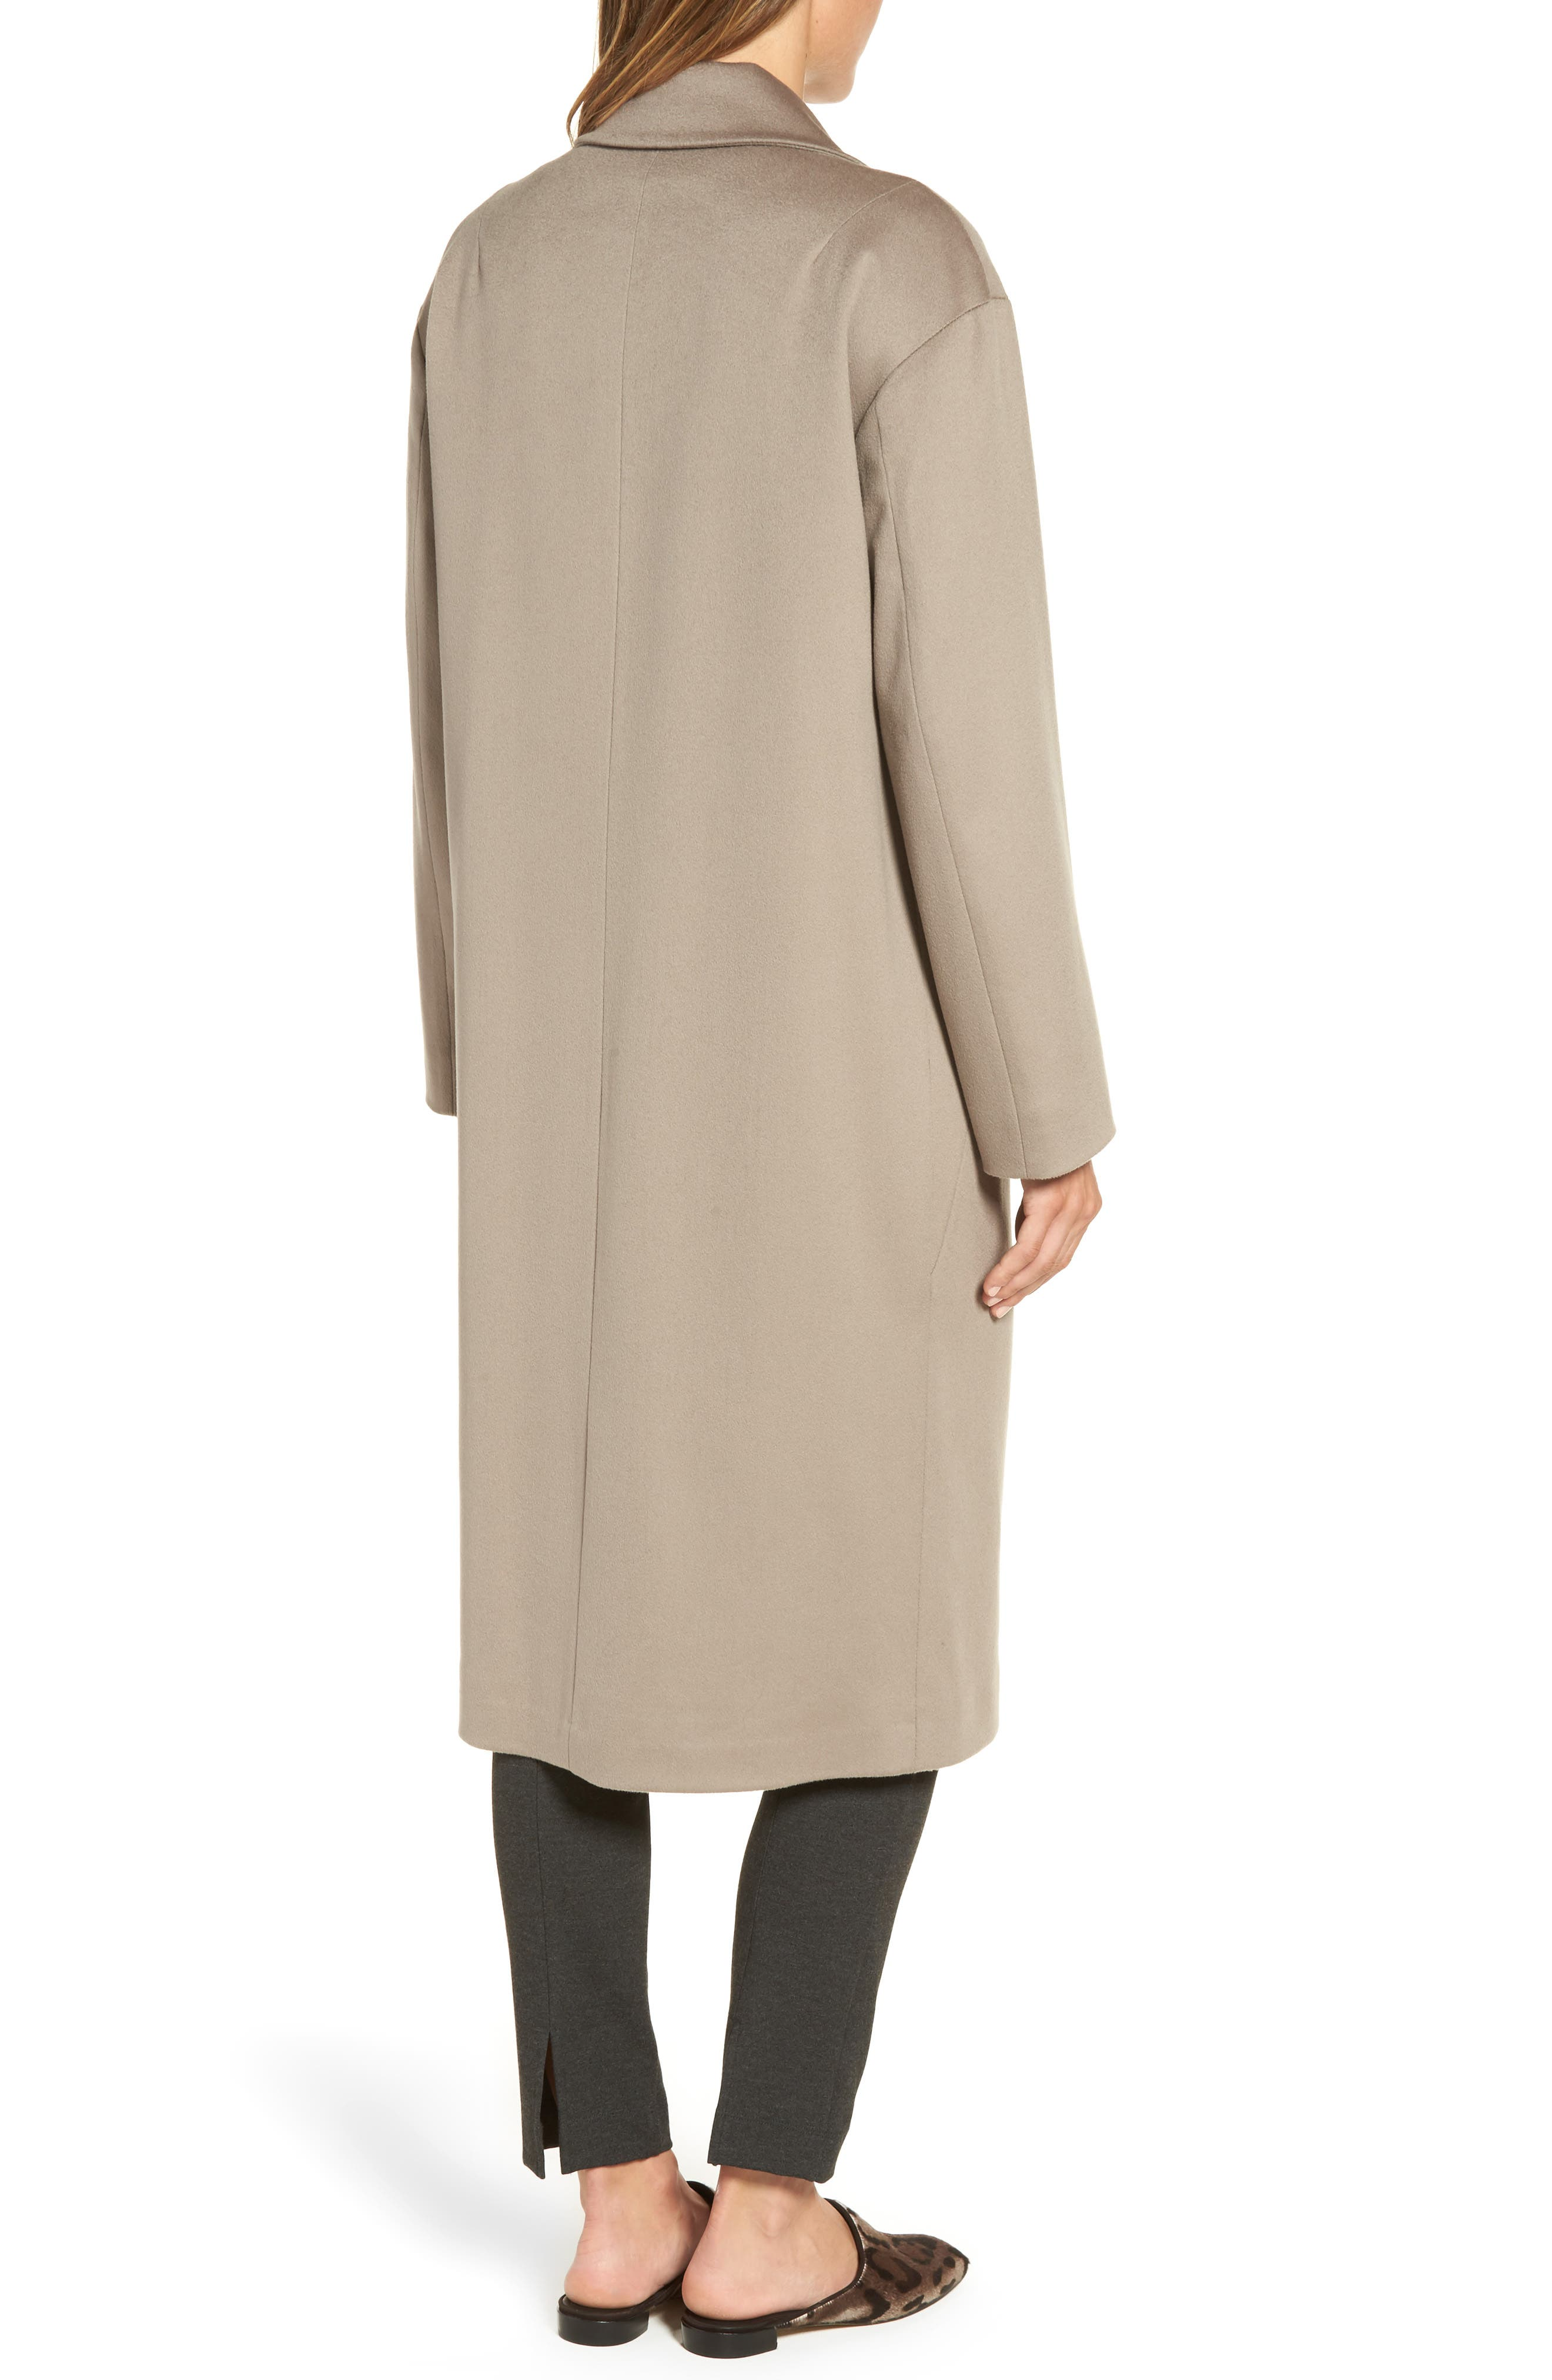 45 Loro Piana Wool Coat,                             Alternate thumbnail 2, color,                             Taupe